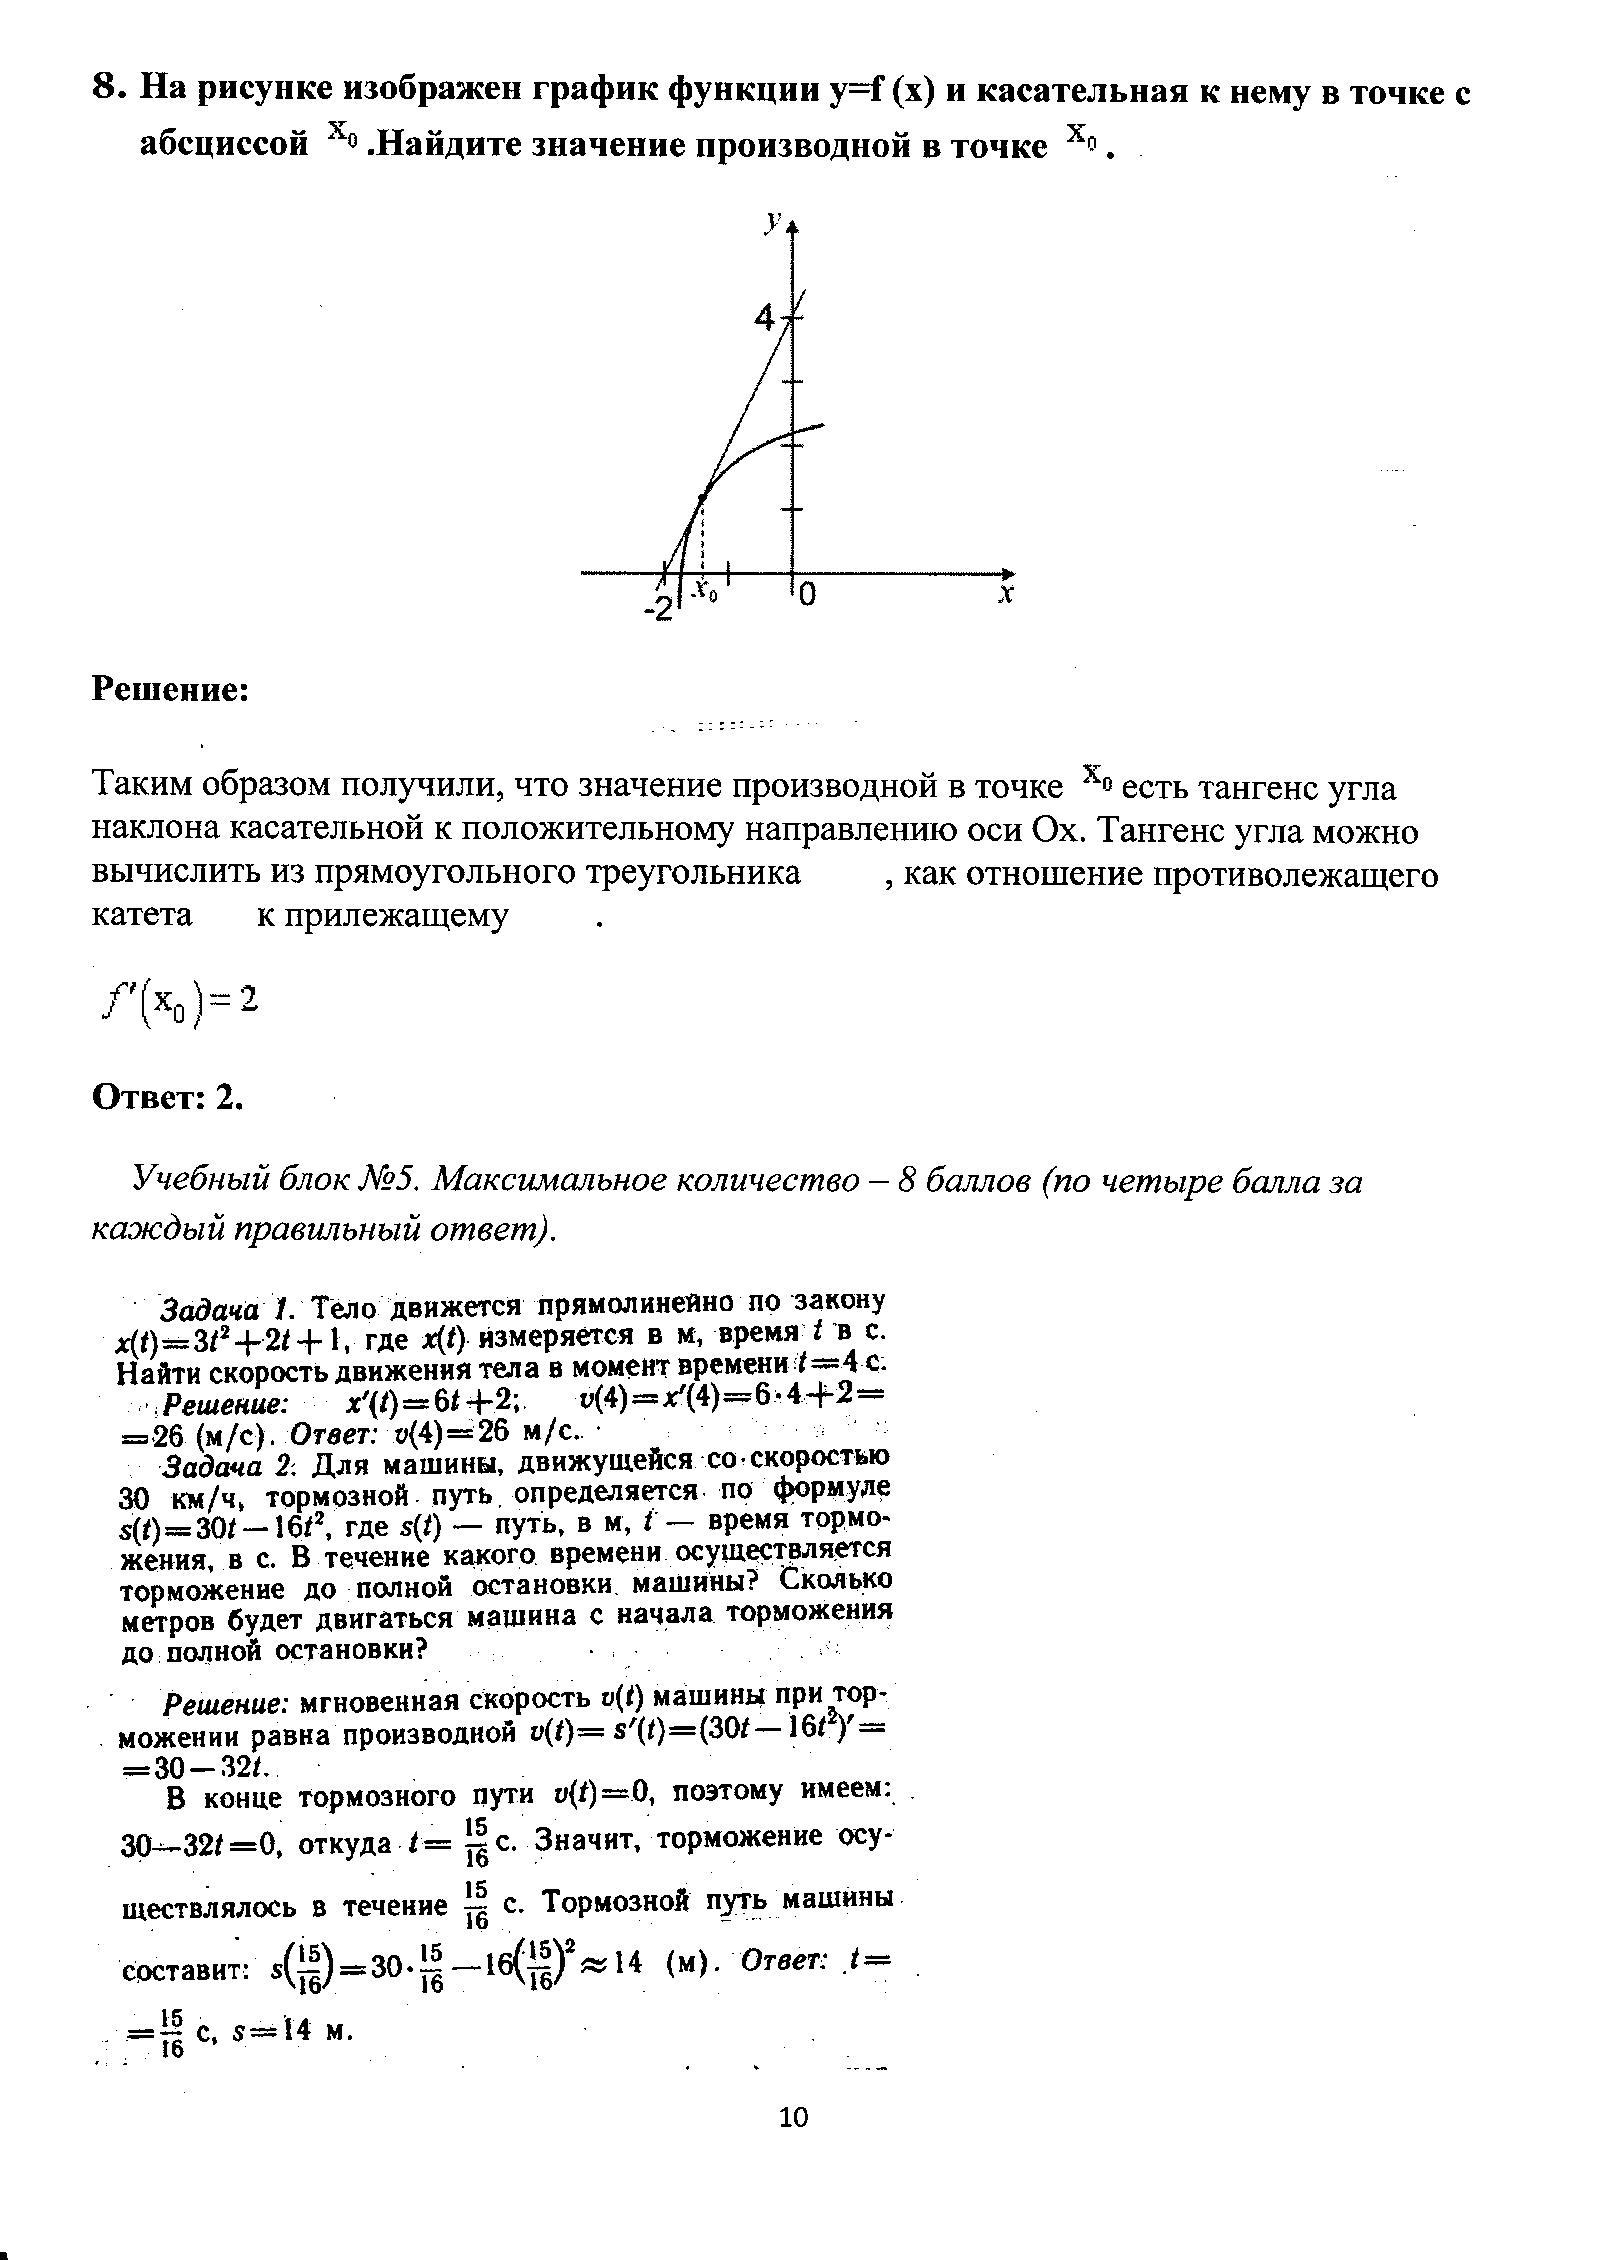 C:\Documents and Settings\Юлия\Мои документы\Мои рисунки\MP Navigator EX\2012_02_20\IMG_0010.tif